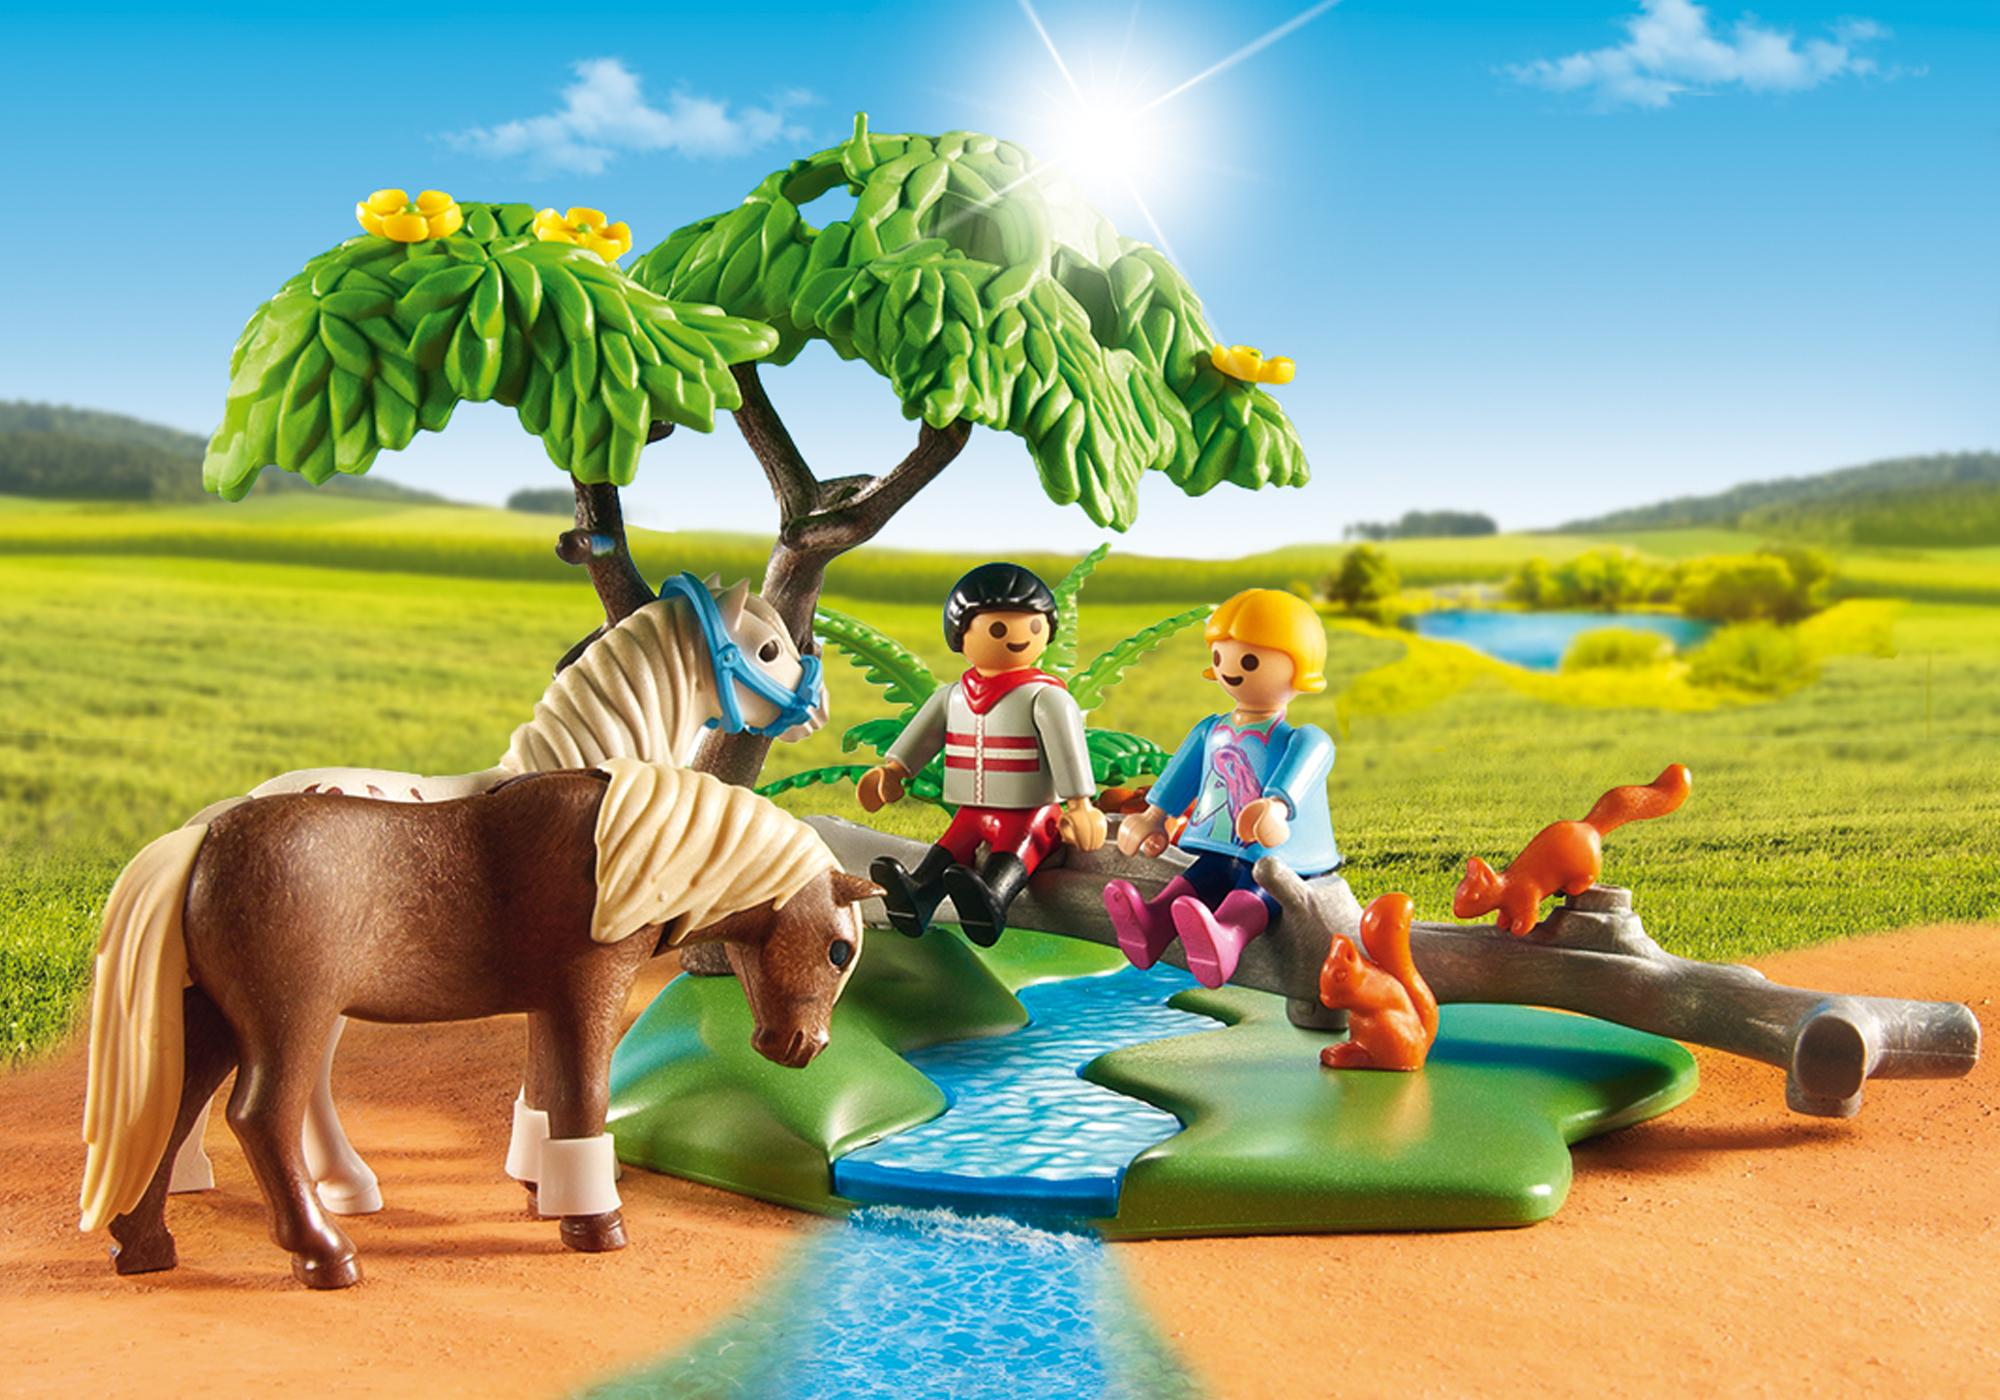 http://media.playmobil.com/i/playmobil/6947_product_extra1/Country Horseback Ride